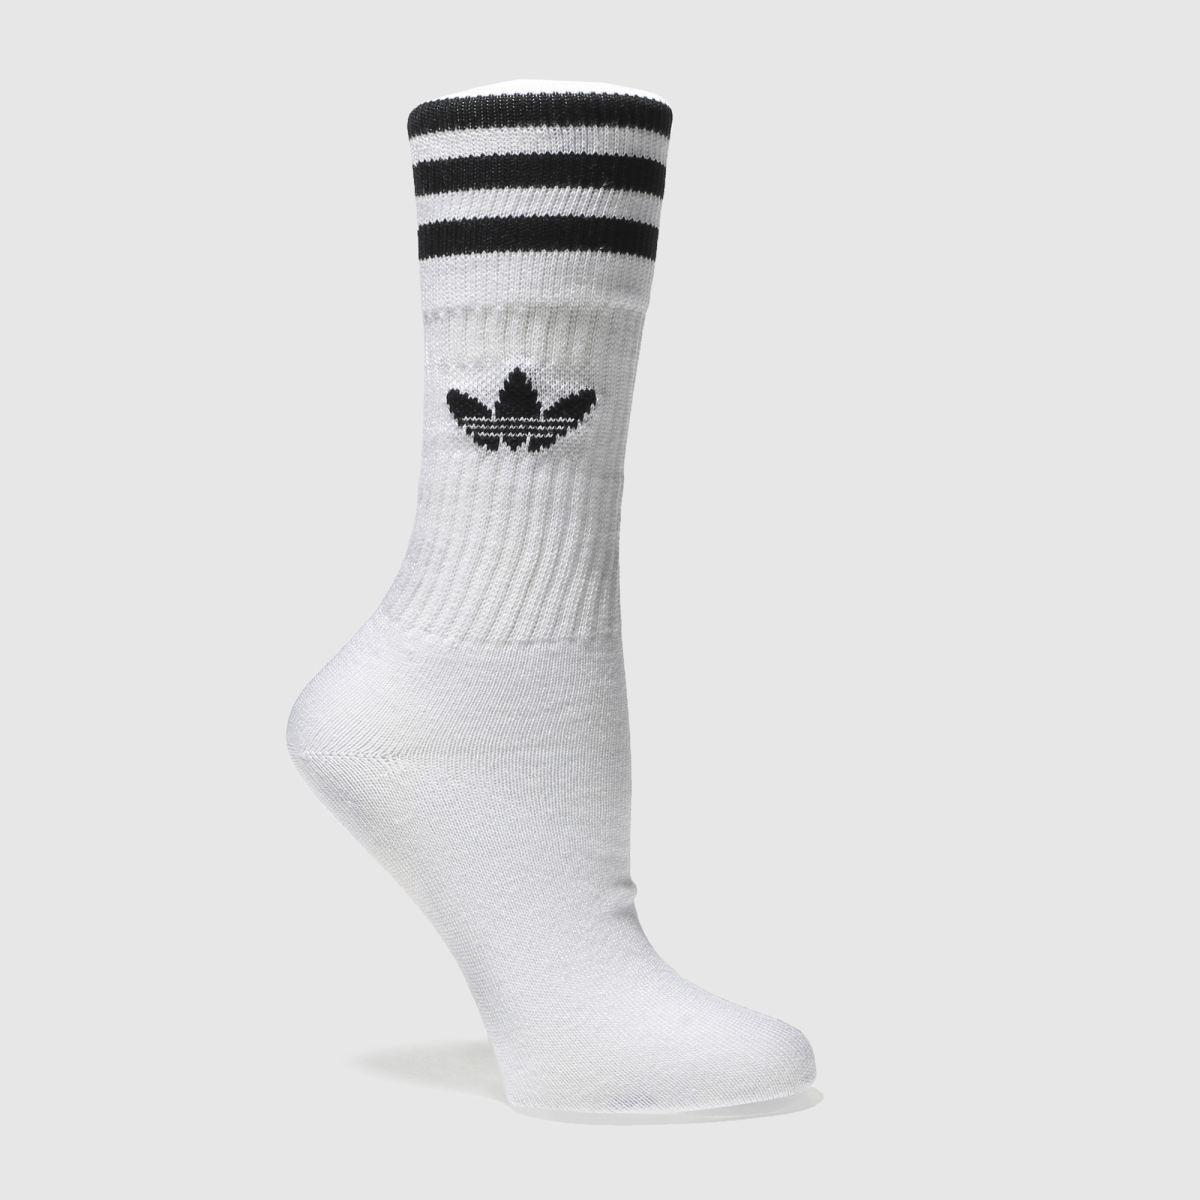 Adidas Adidas White & Black Solid Crew 3 Pack 5.5-8